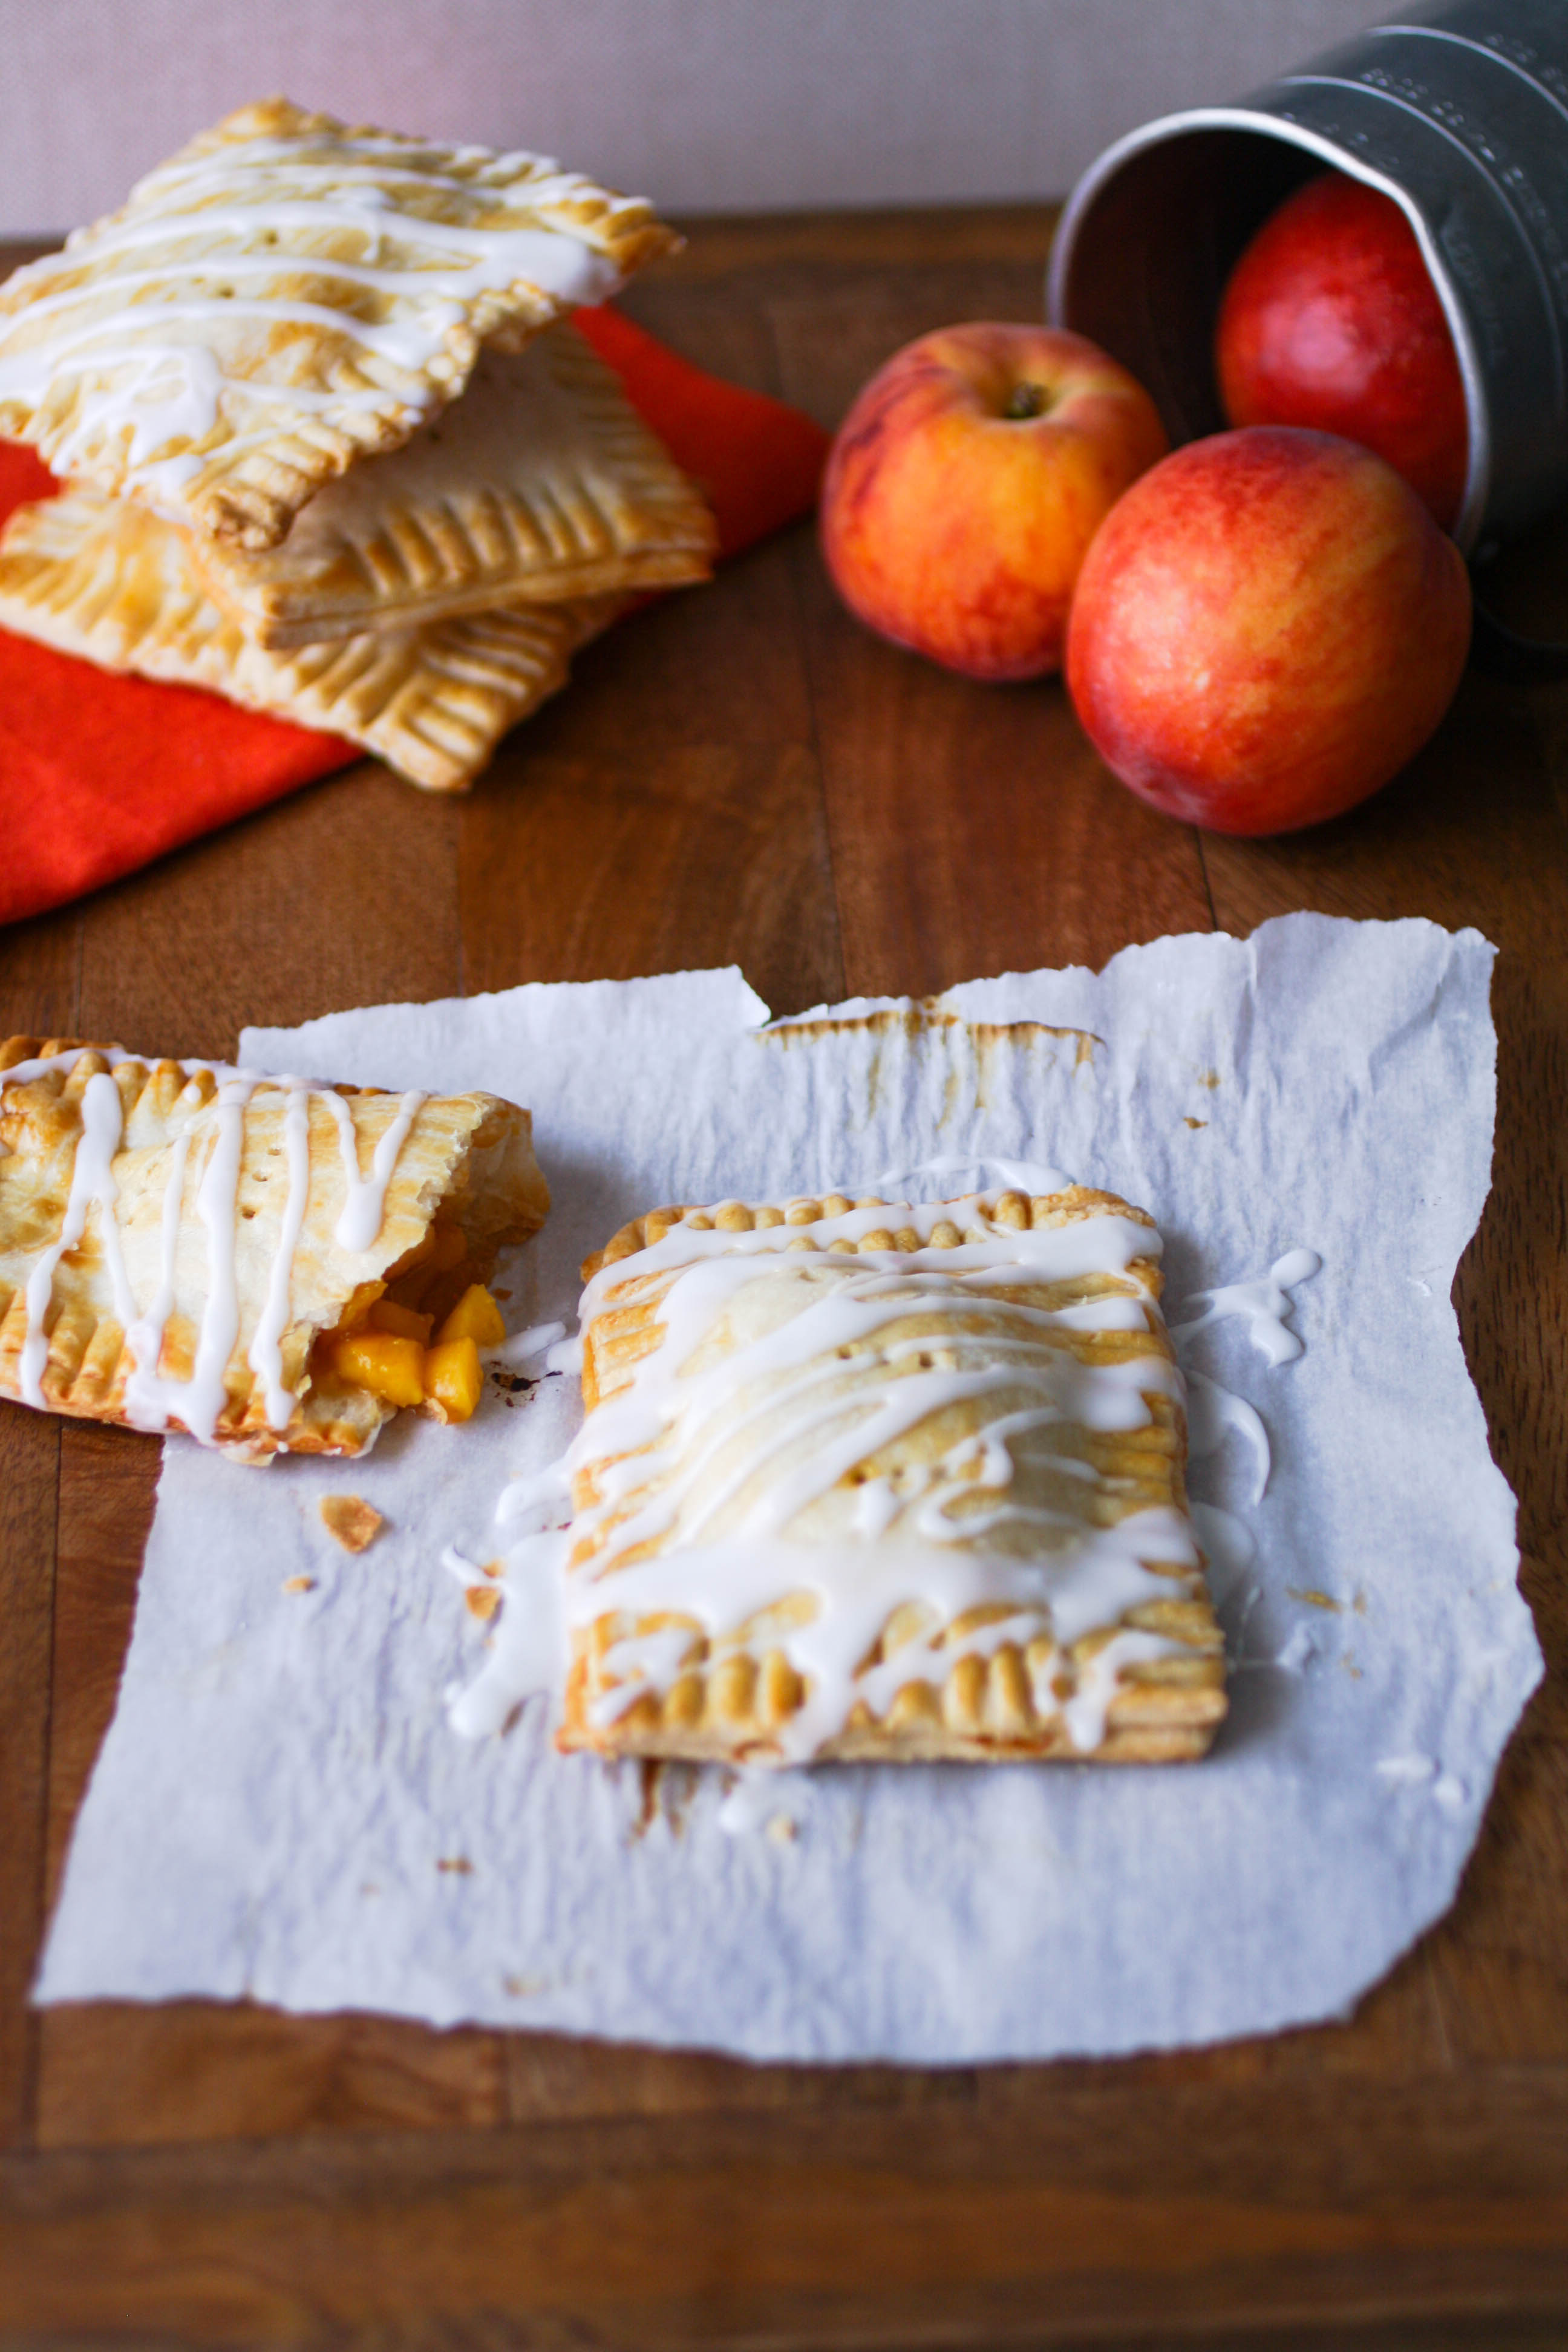 "Fresh Peach Pie ""Pop Tarts"" will make you smile! These wonderful, homemade treats are amazing!"